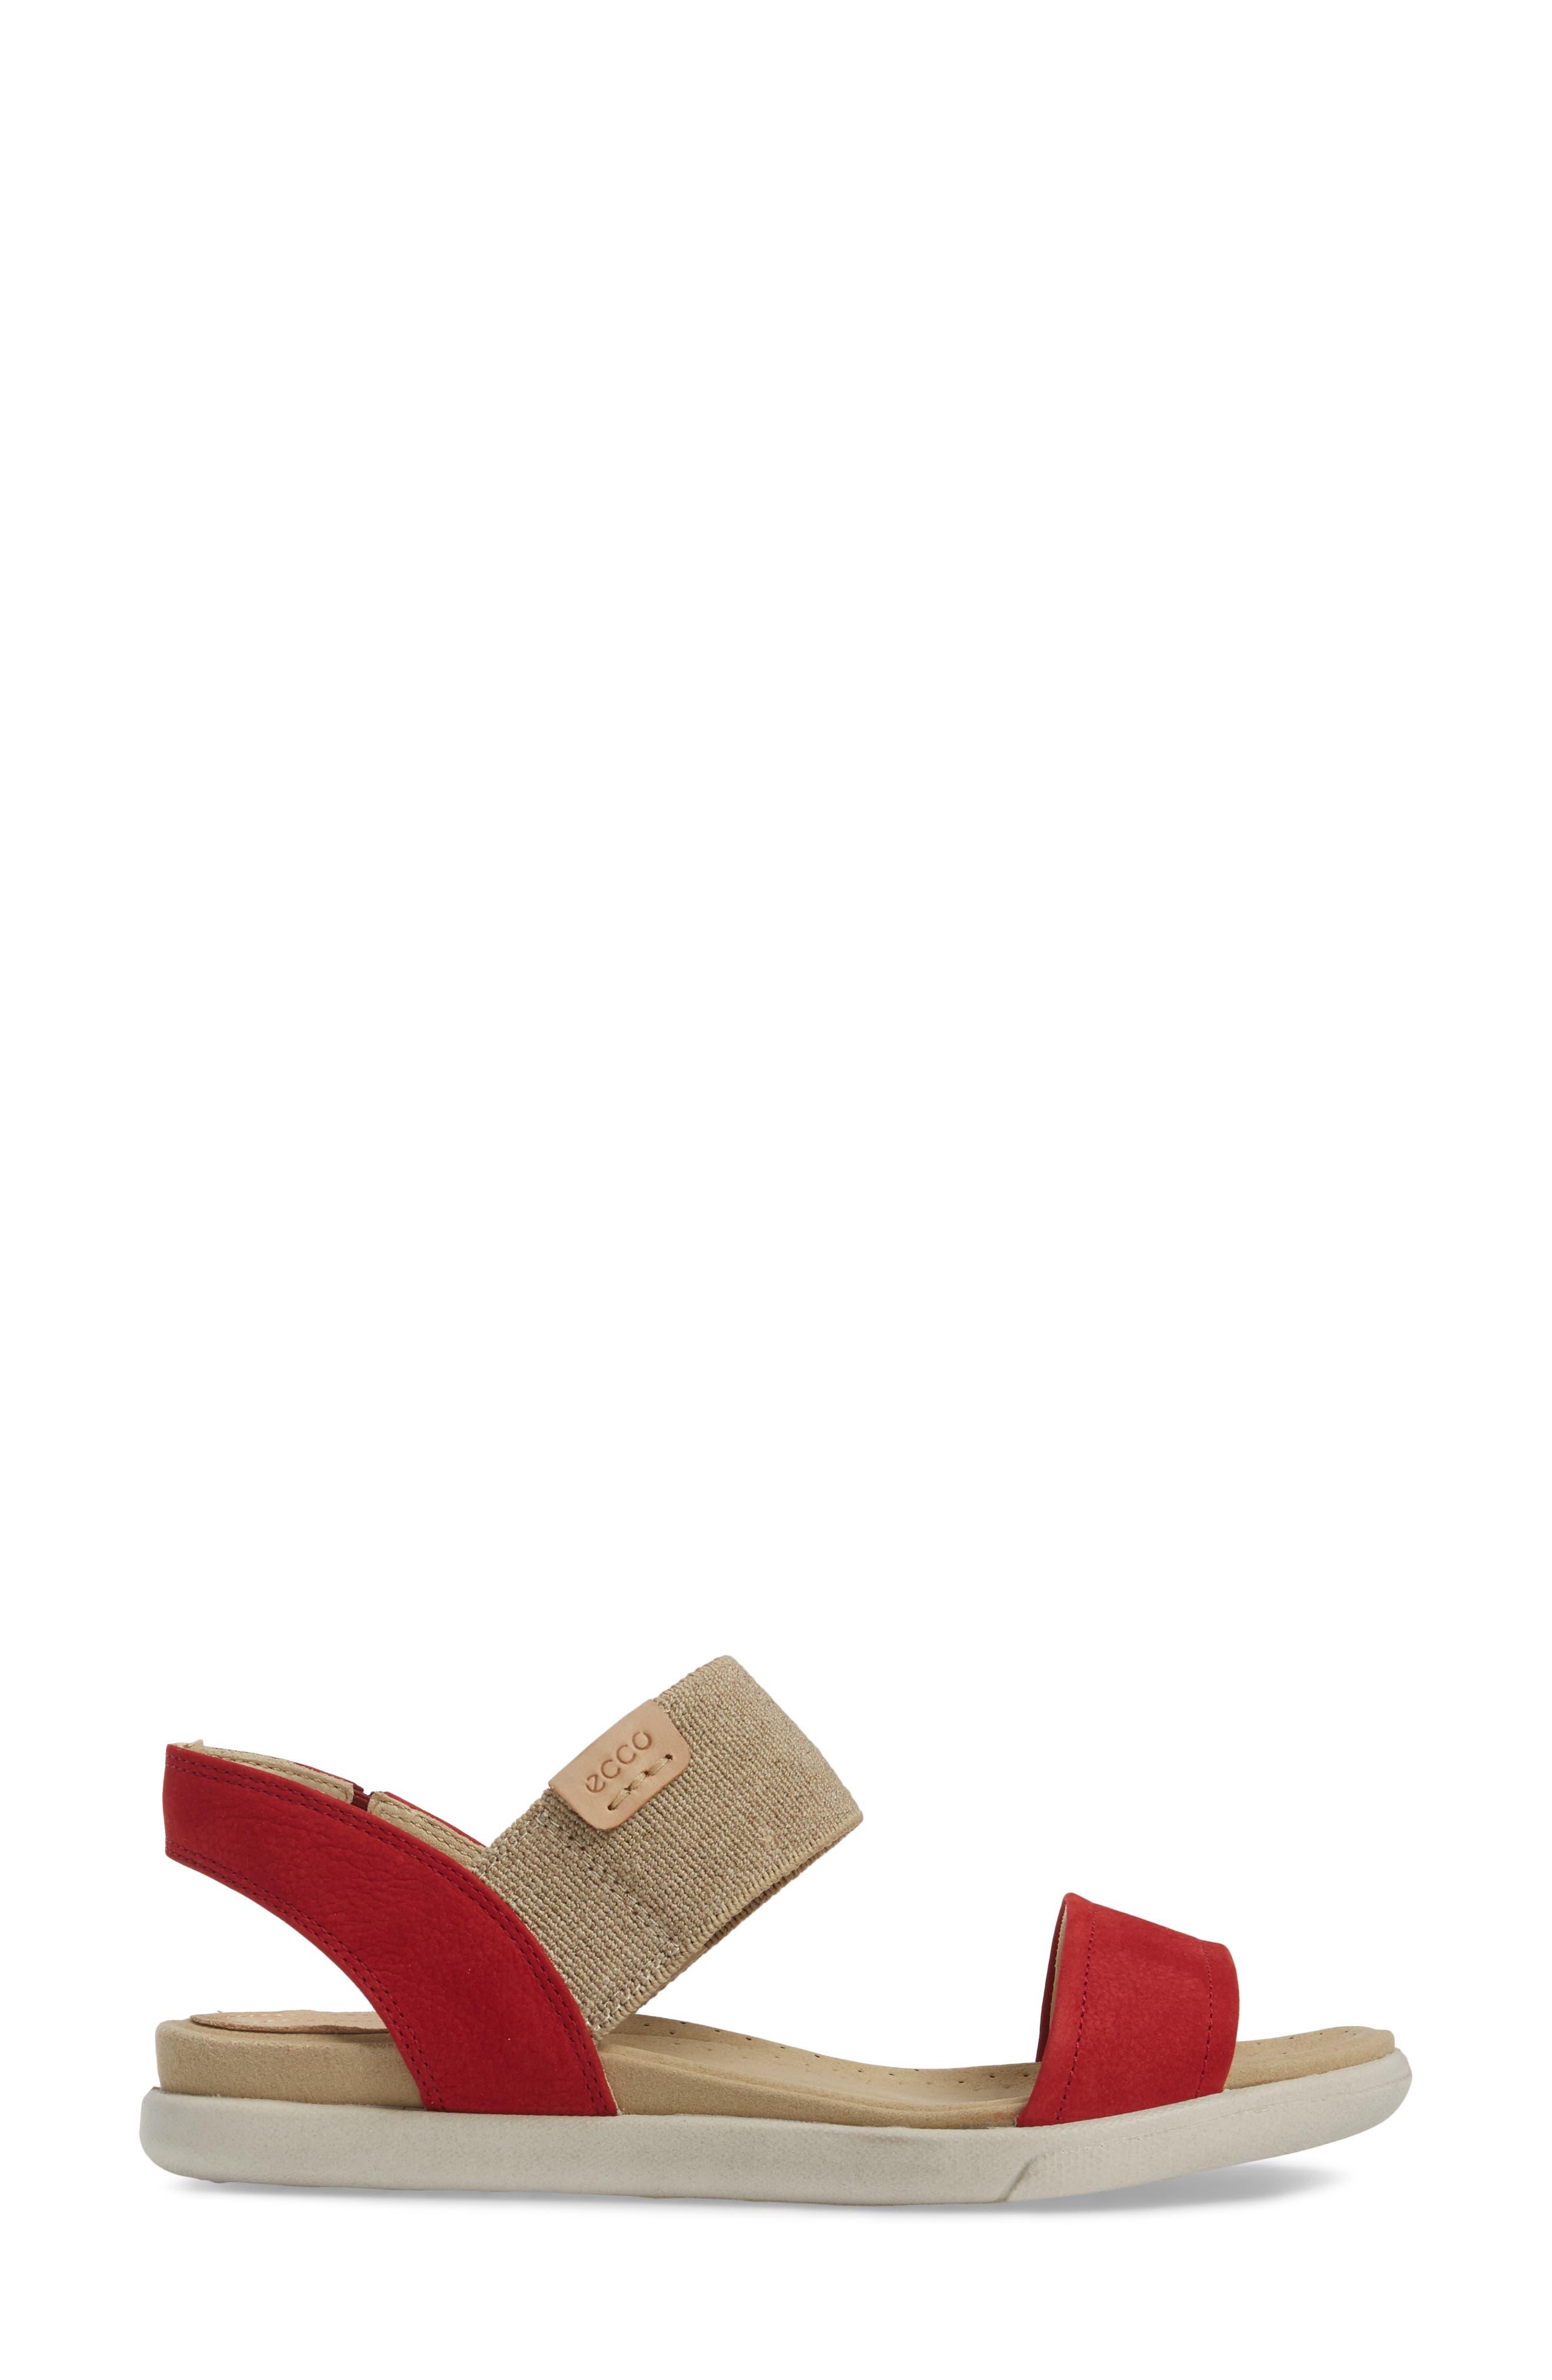 'Damara' Sandal,                             Alternate thumbnail 3, color,                             CHILI RED LEATHER